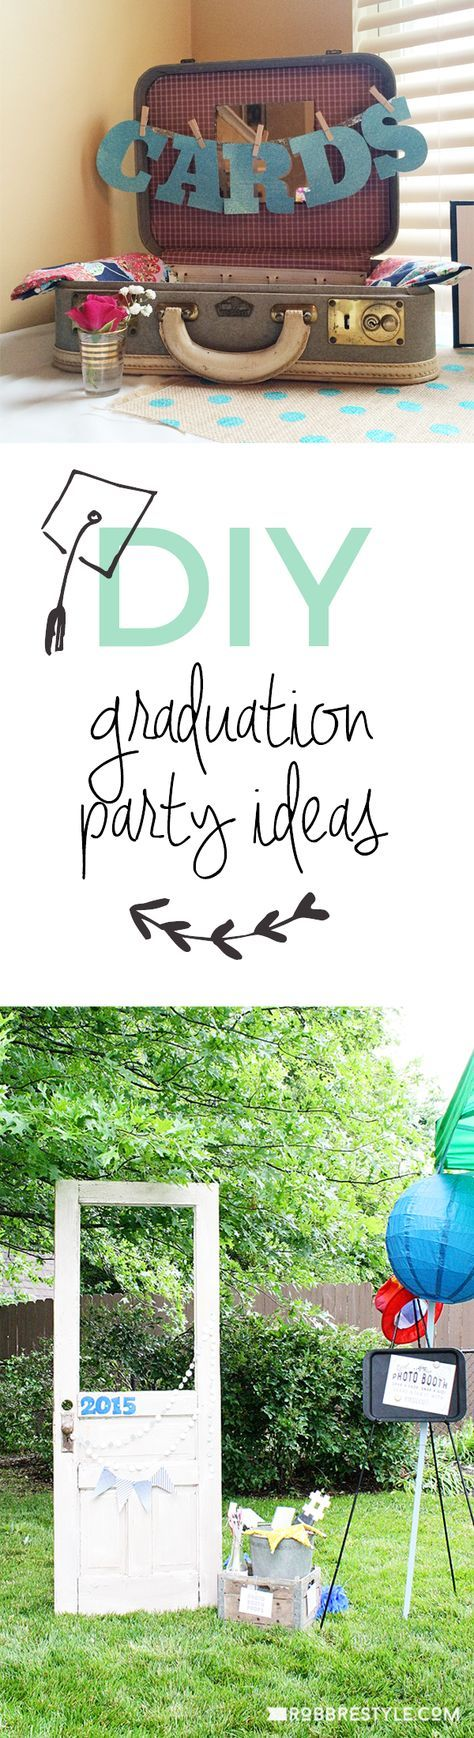 DIY Graduation Party Ideas 1031 best Graduation